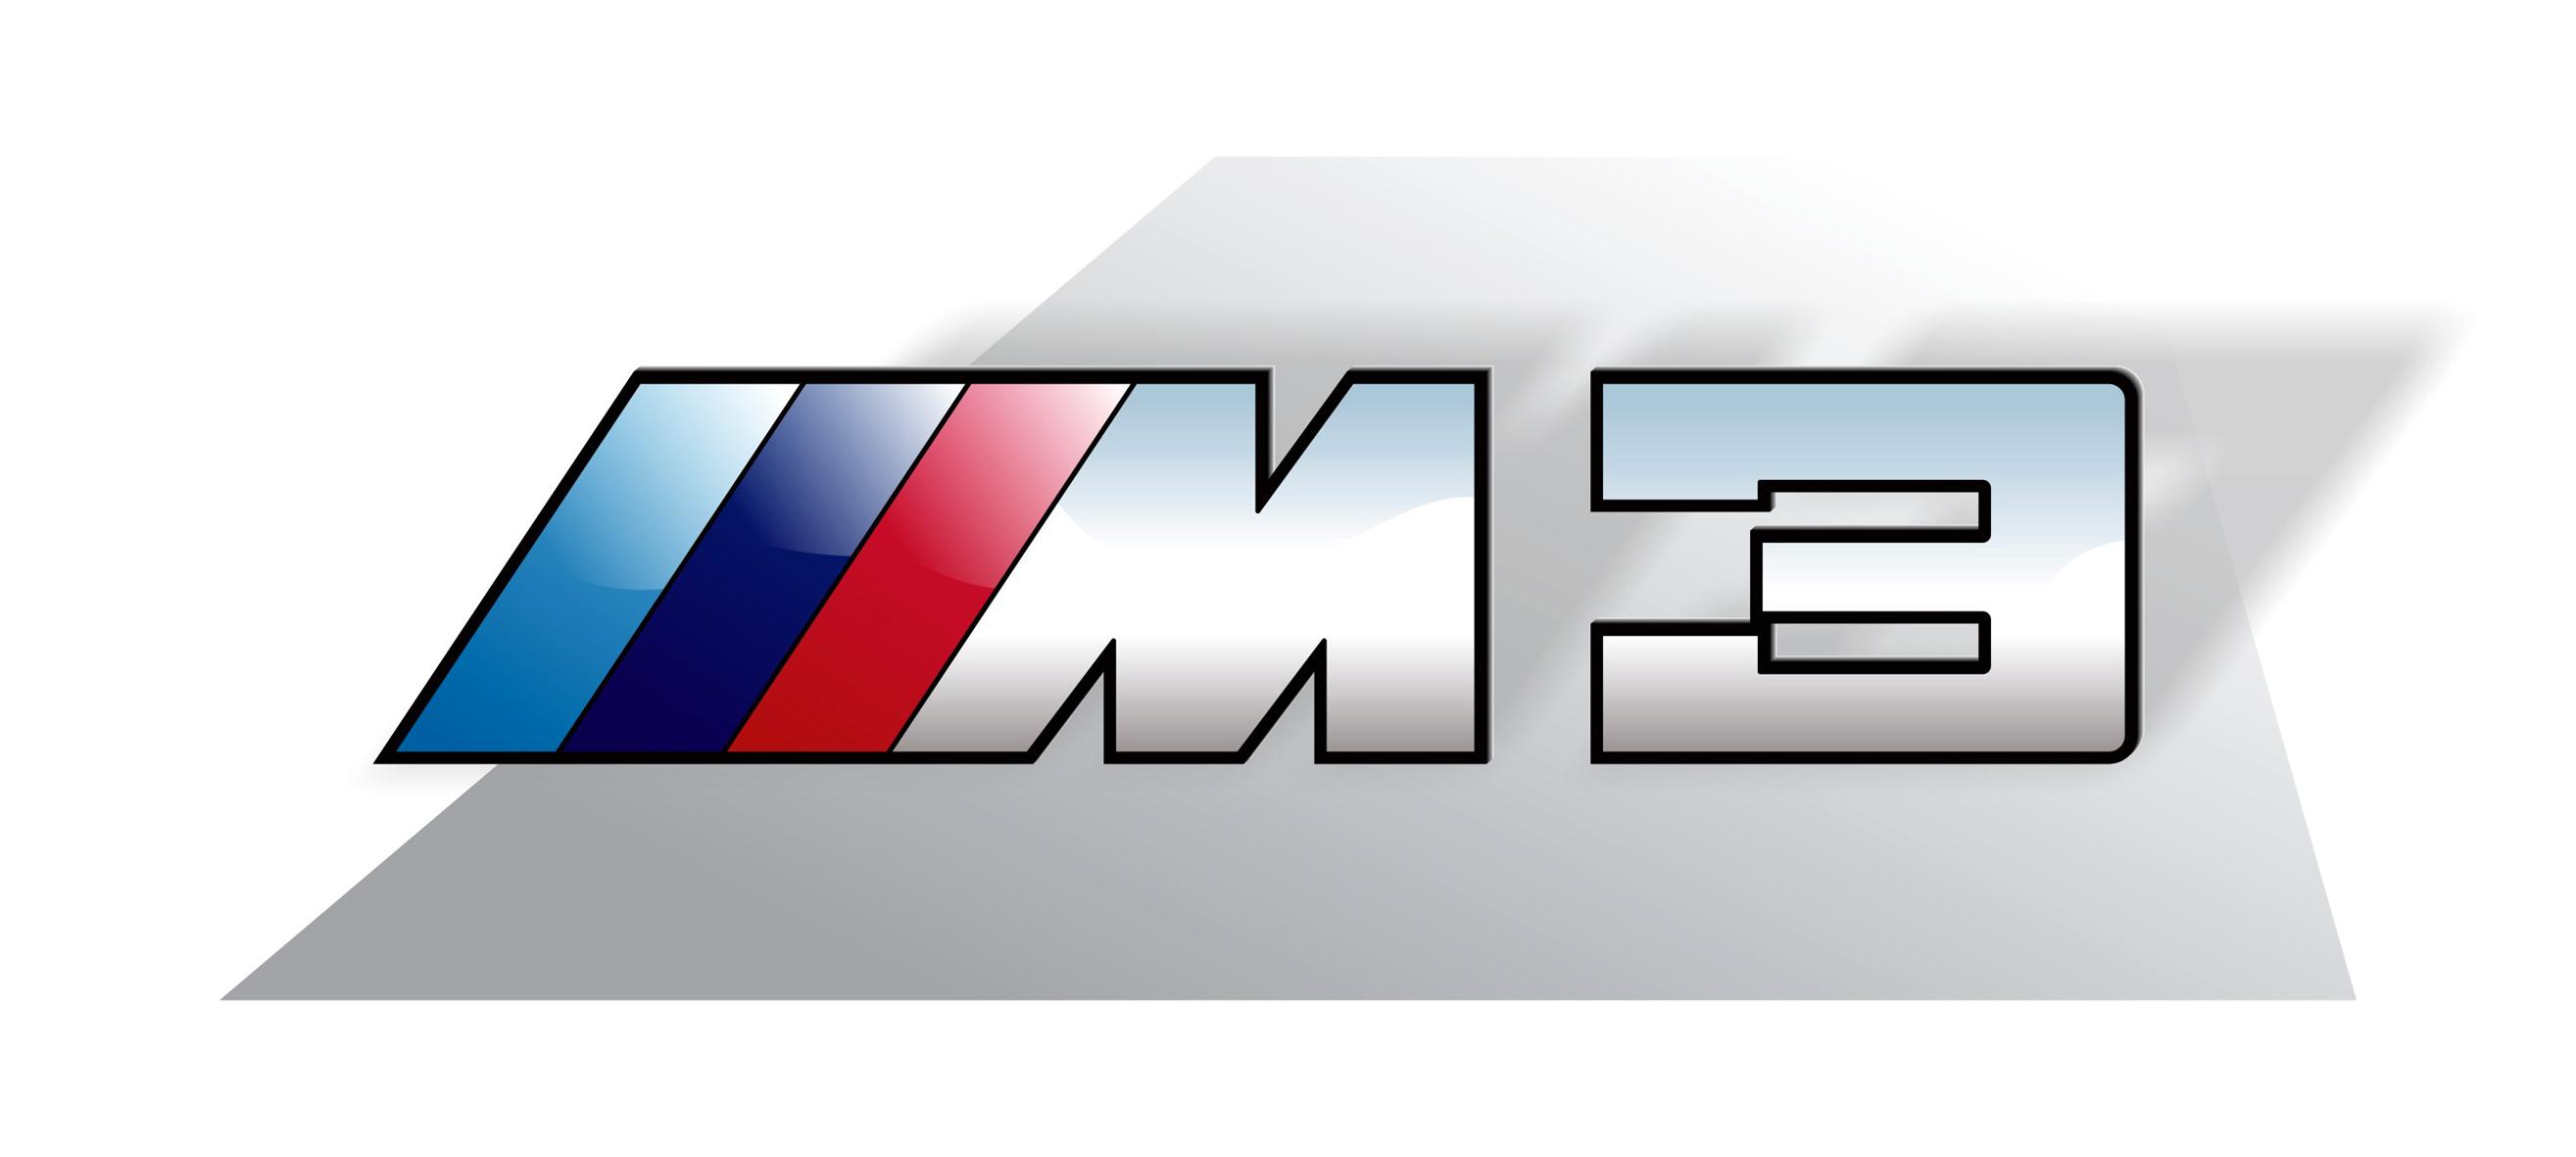 bmw m logo vector. m3 badge by str8te6 bmw m logo vector